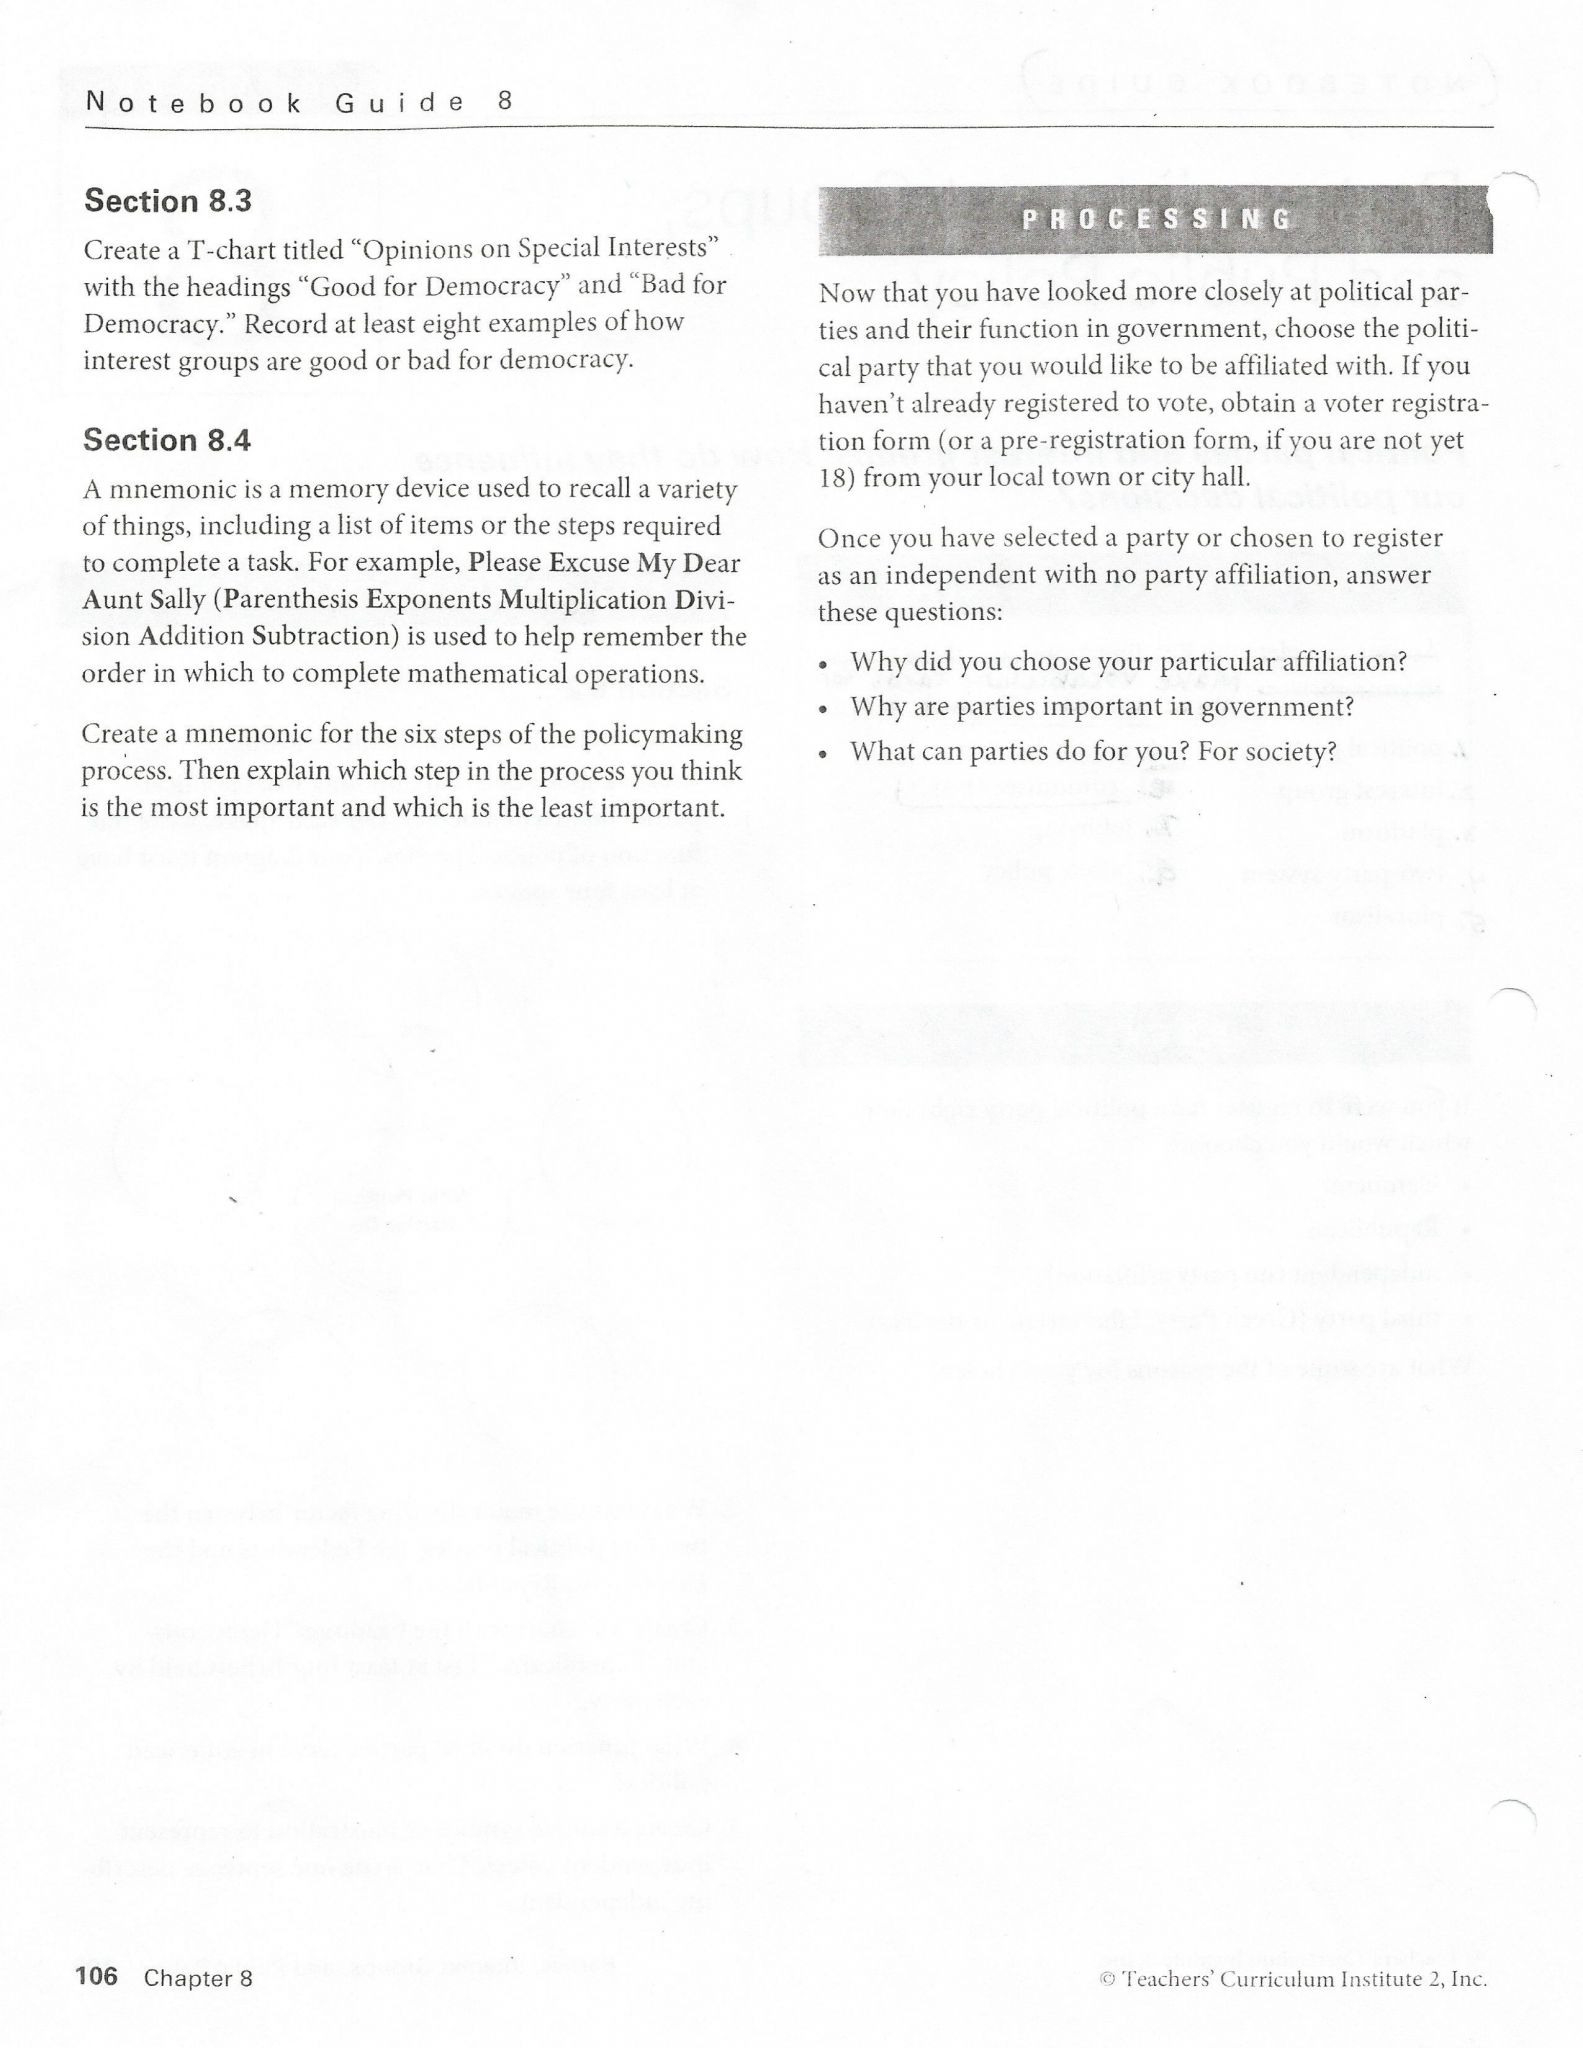 Teachers Curriculum Institute Worksheet Answers